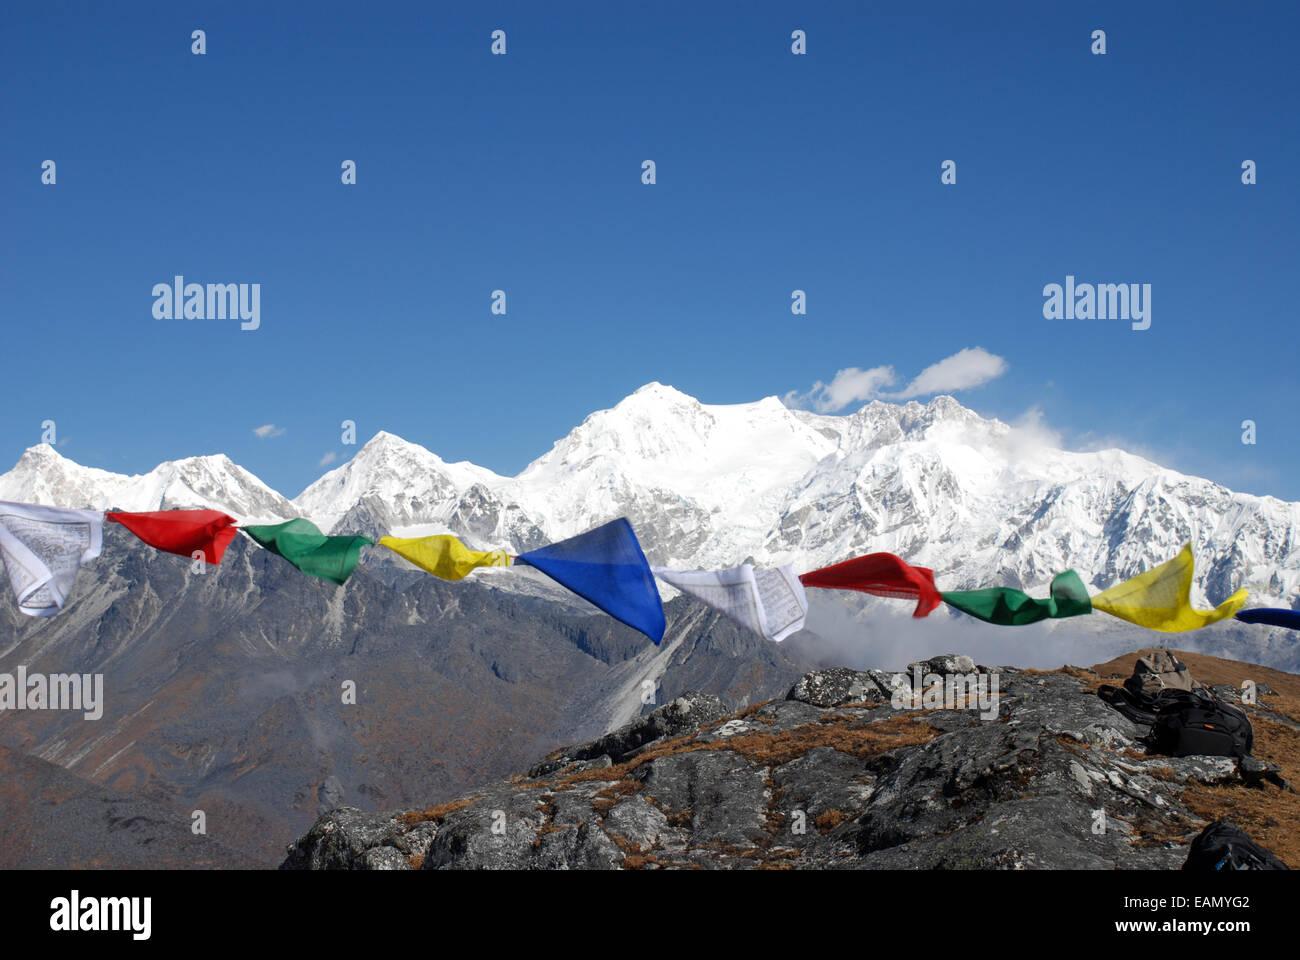 The Himalayan mountain of Kangchenjunga is framed by Buddhist prayer ...